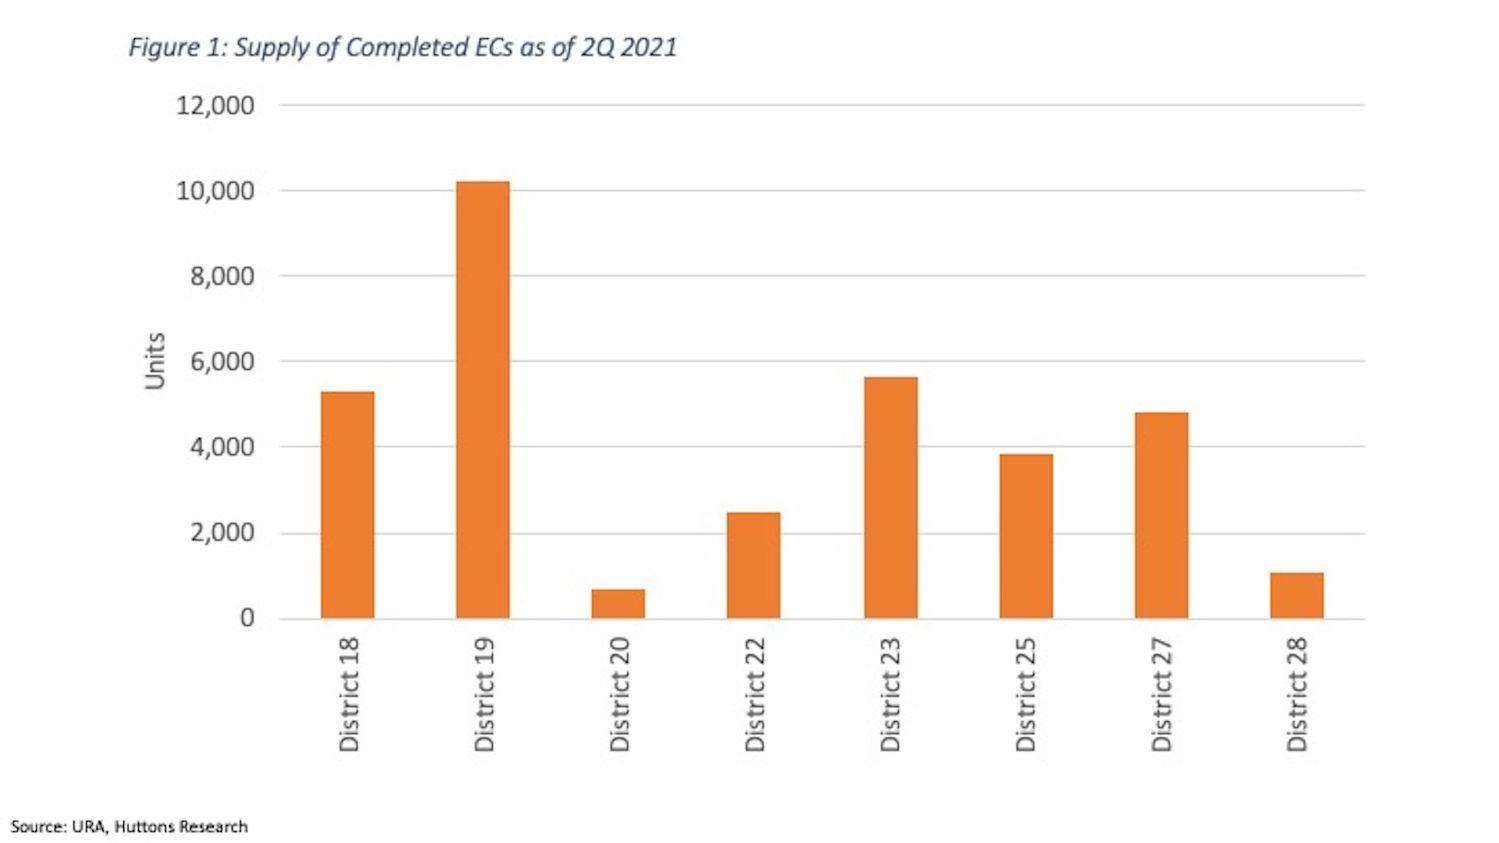 EC Supply - EDGEPROP SINGAPORE